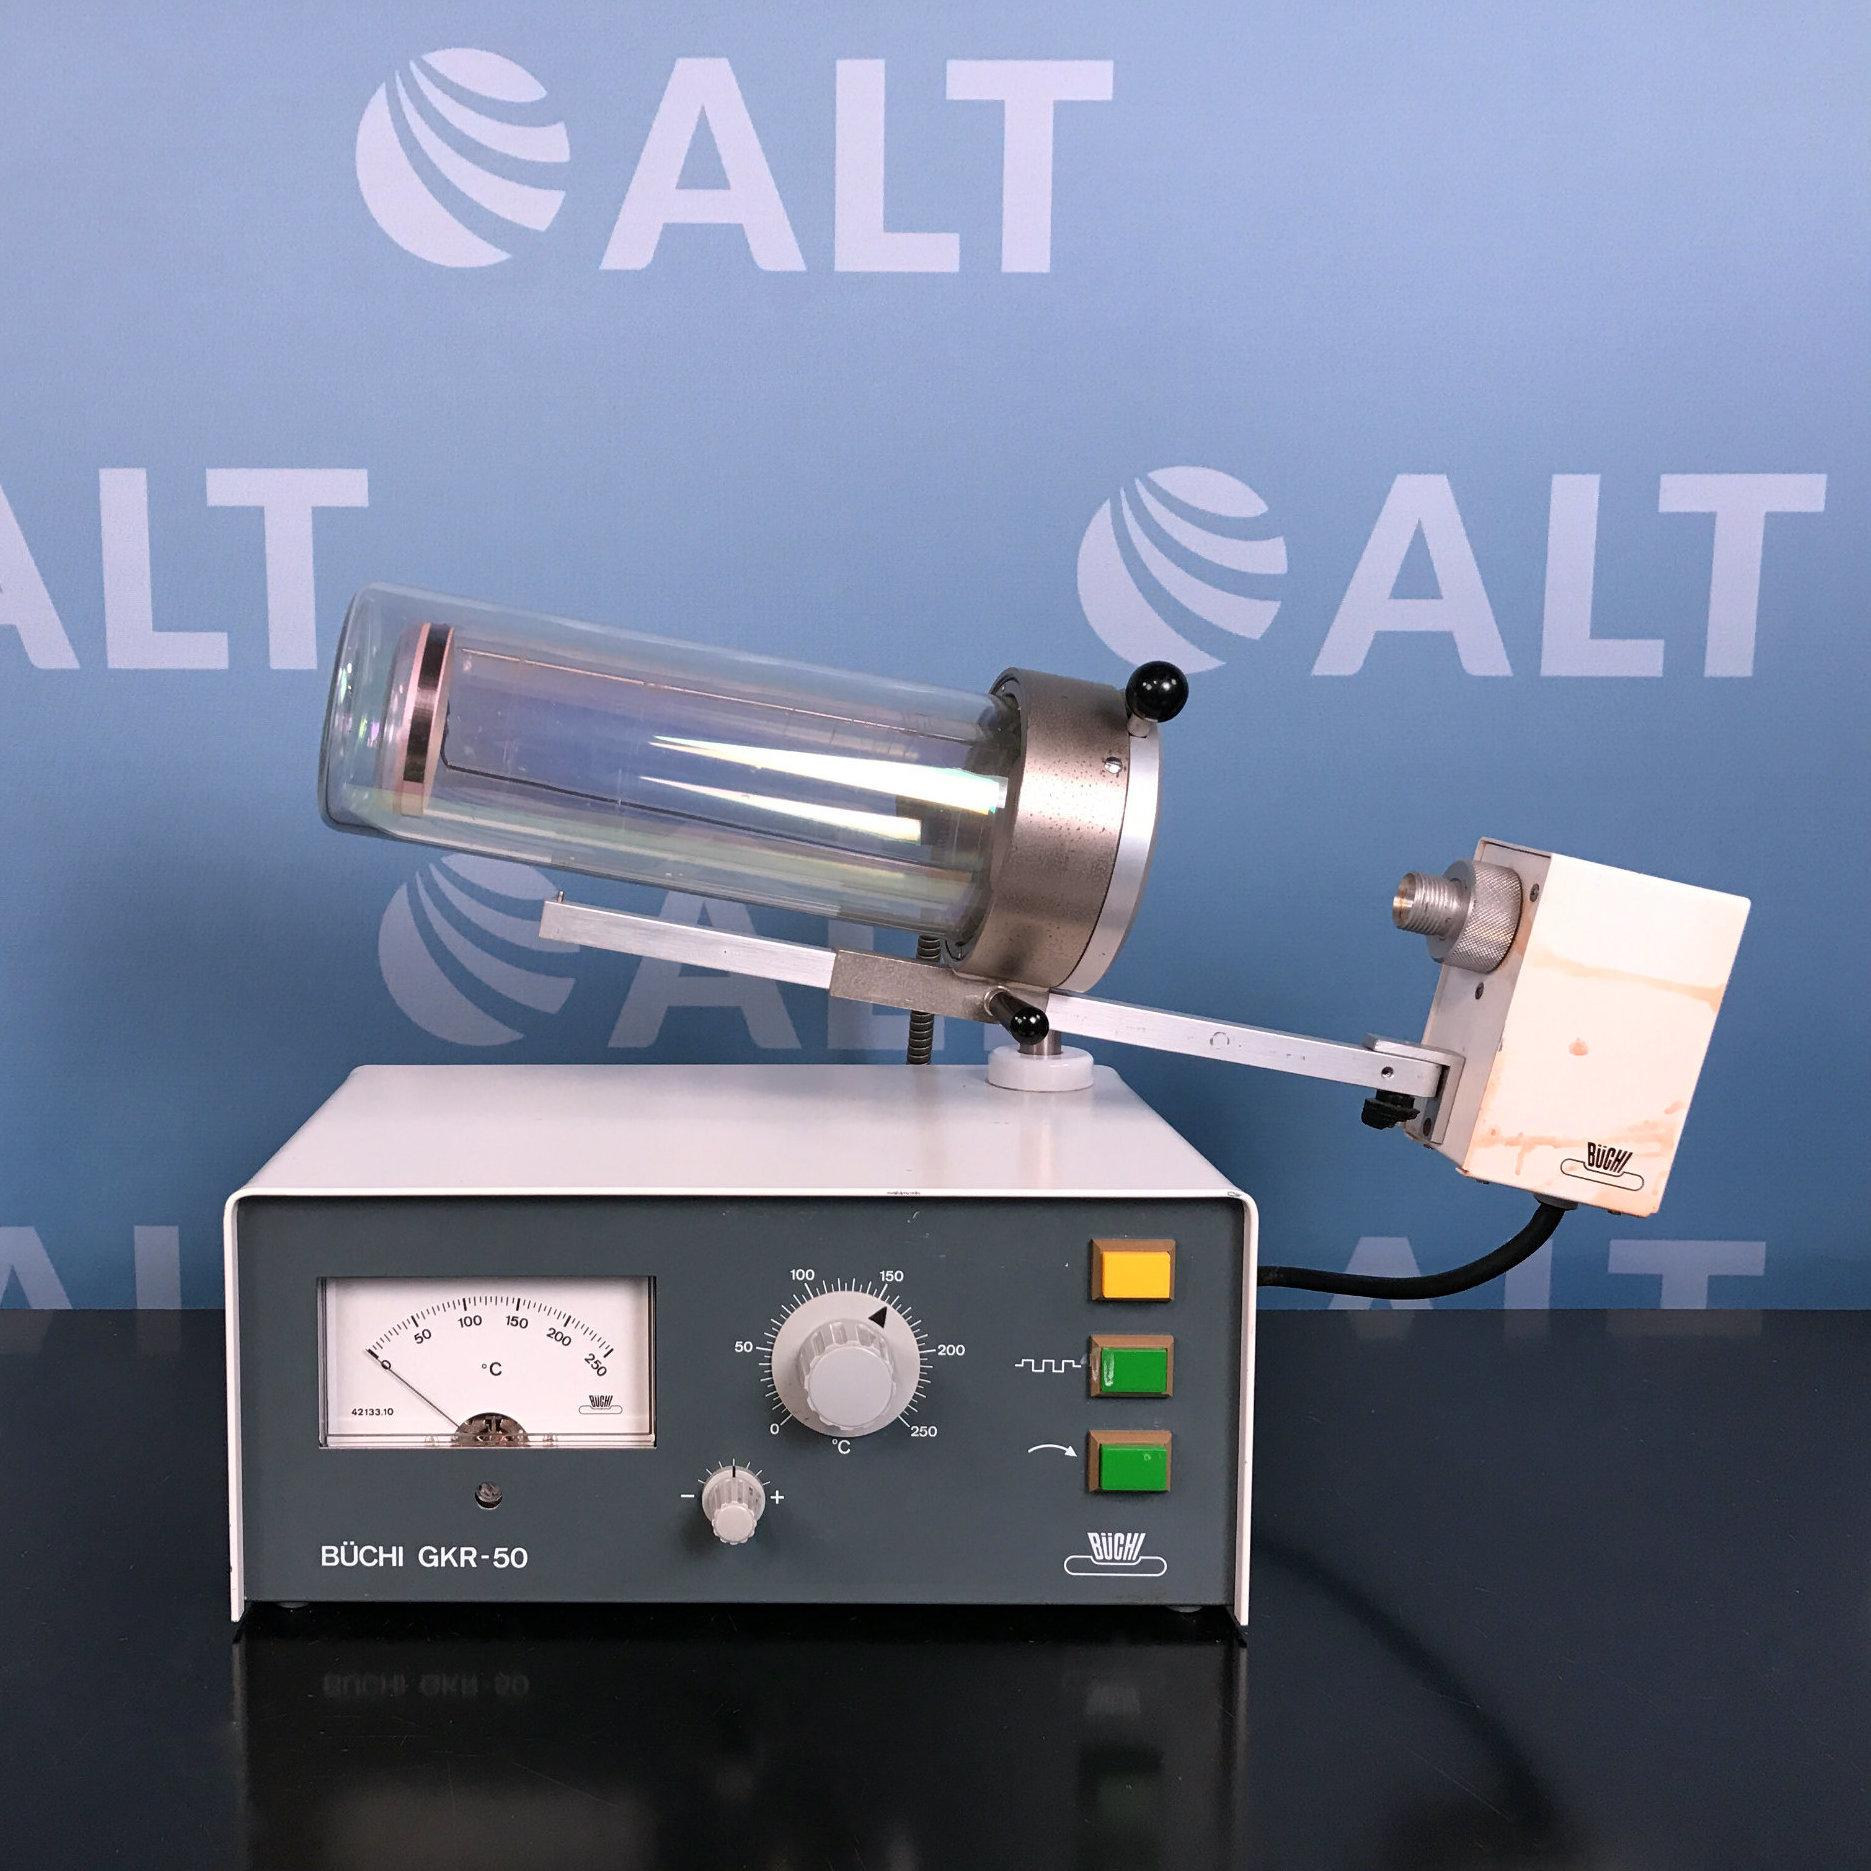 Buchi GKR-50 Glass Tube Oven Image